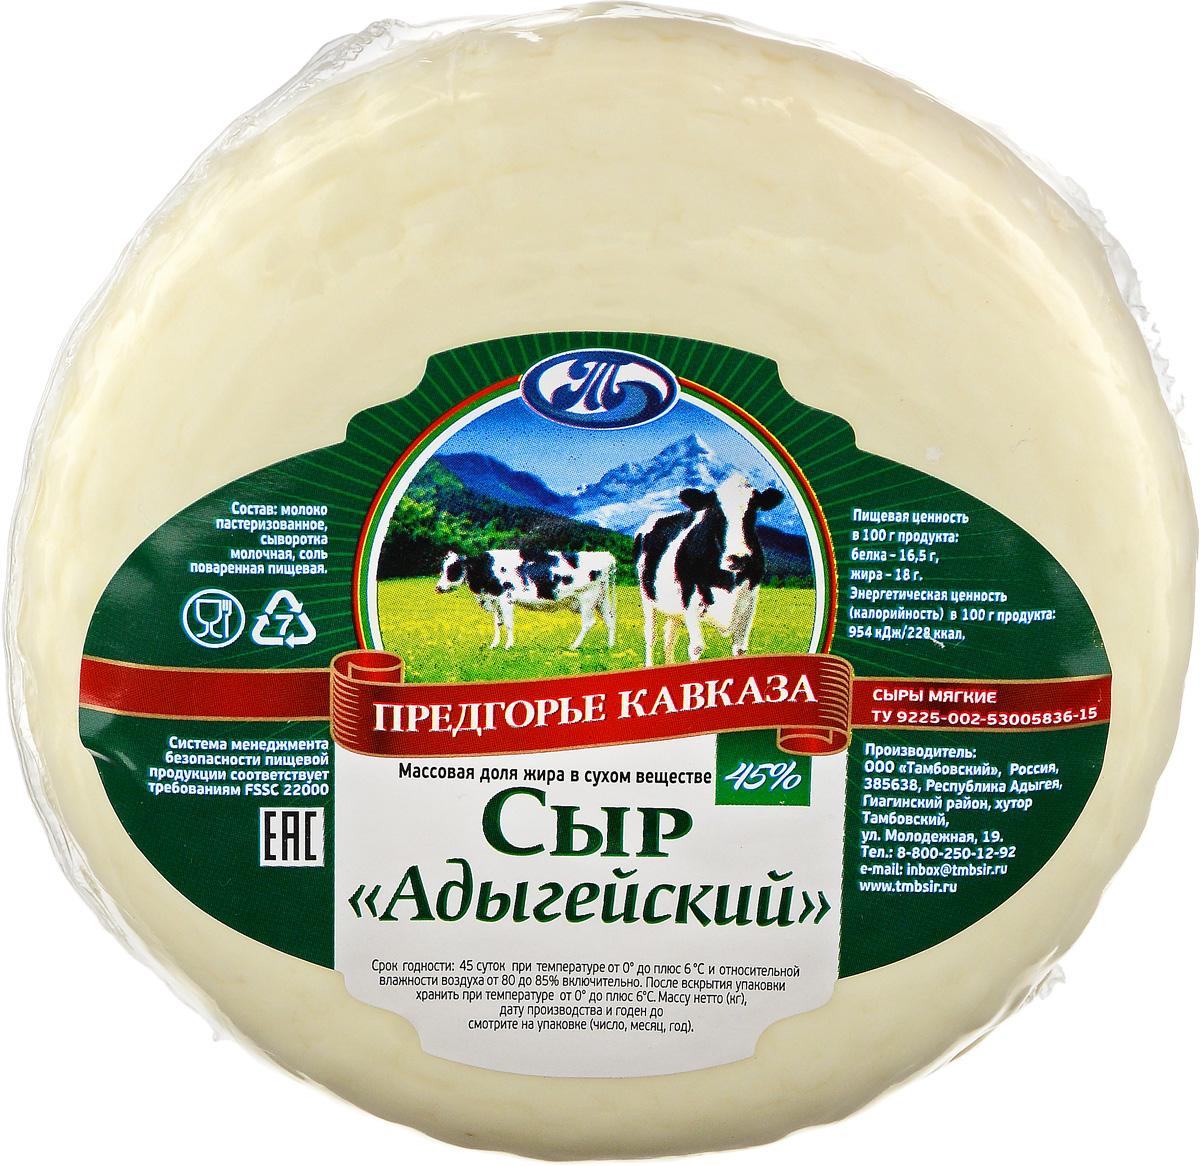 Предгорье Кавказа Сыр Адыгейский, 45%, 300 г